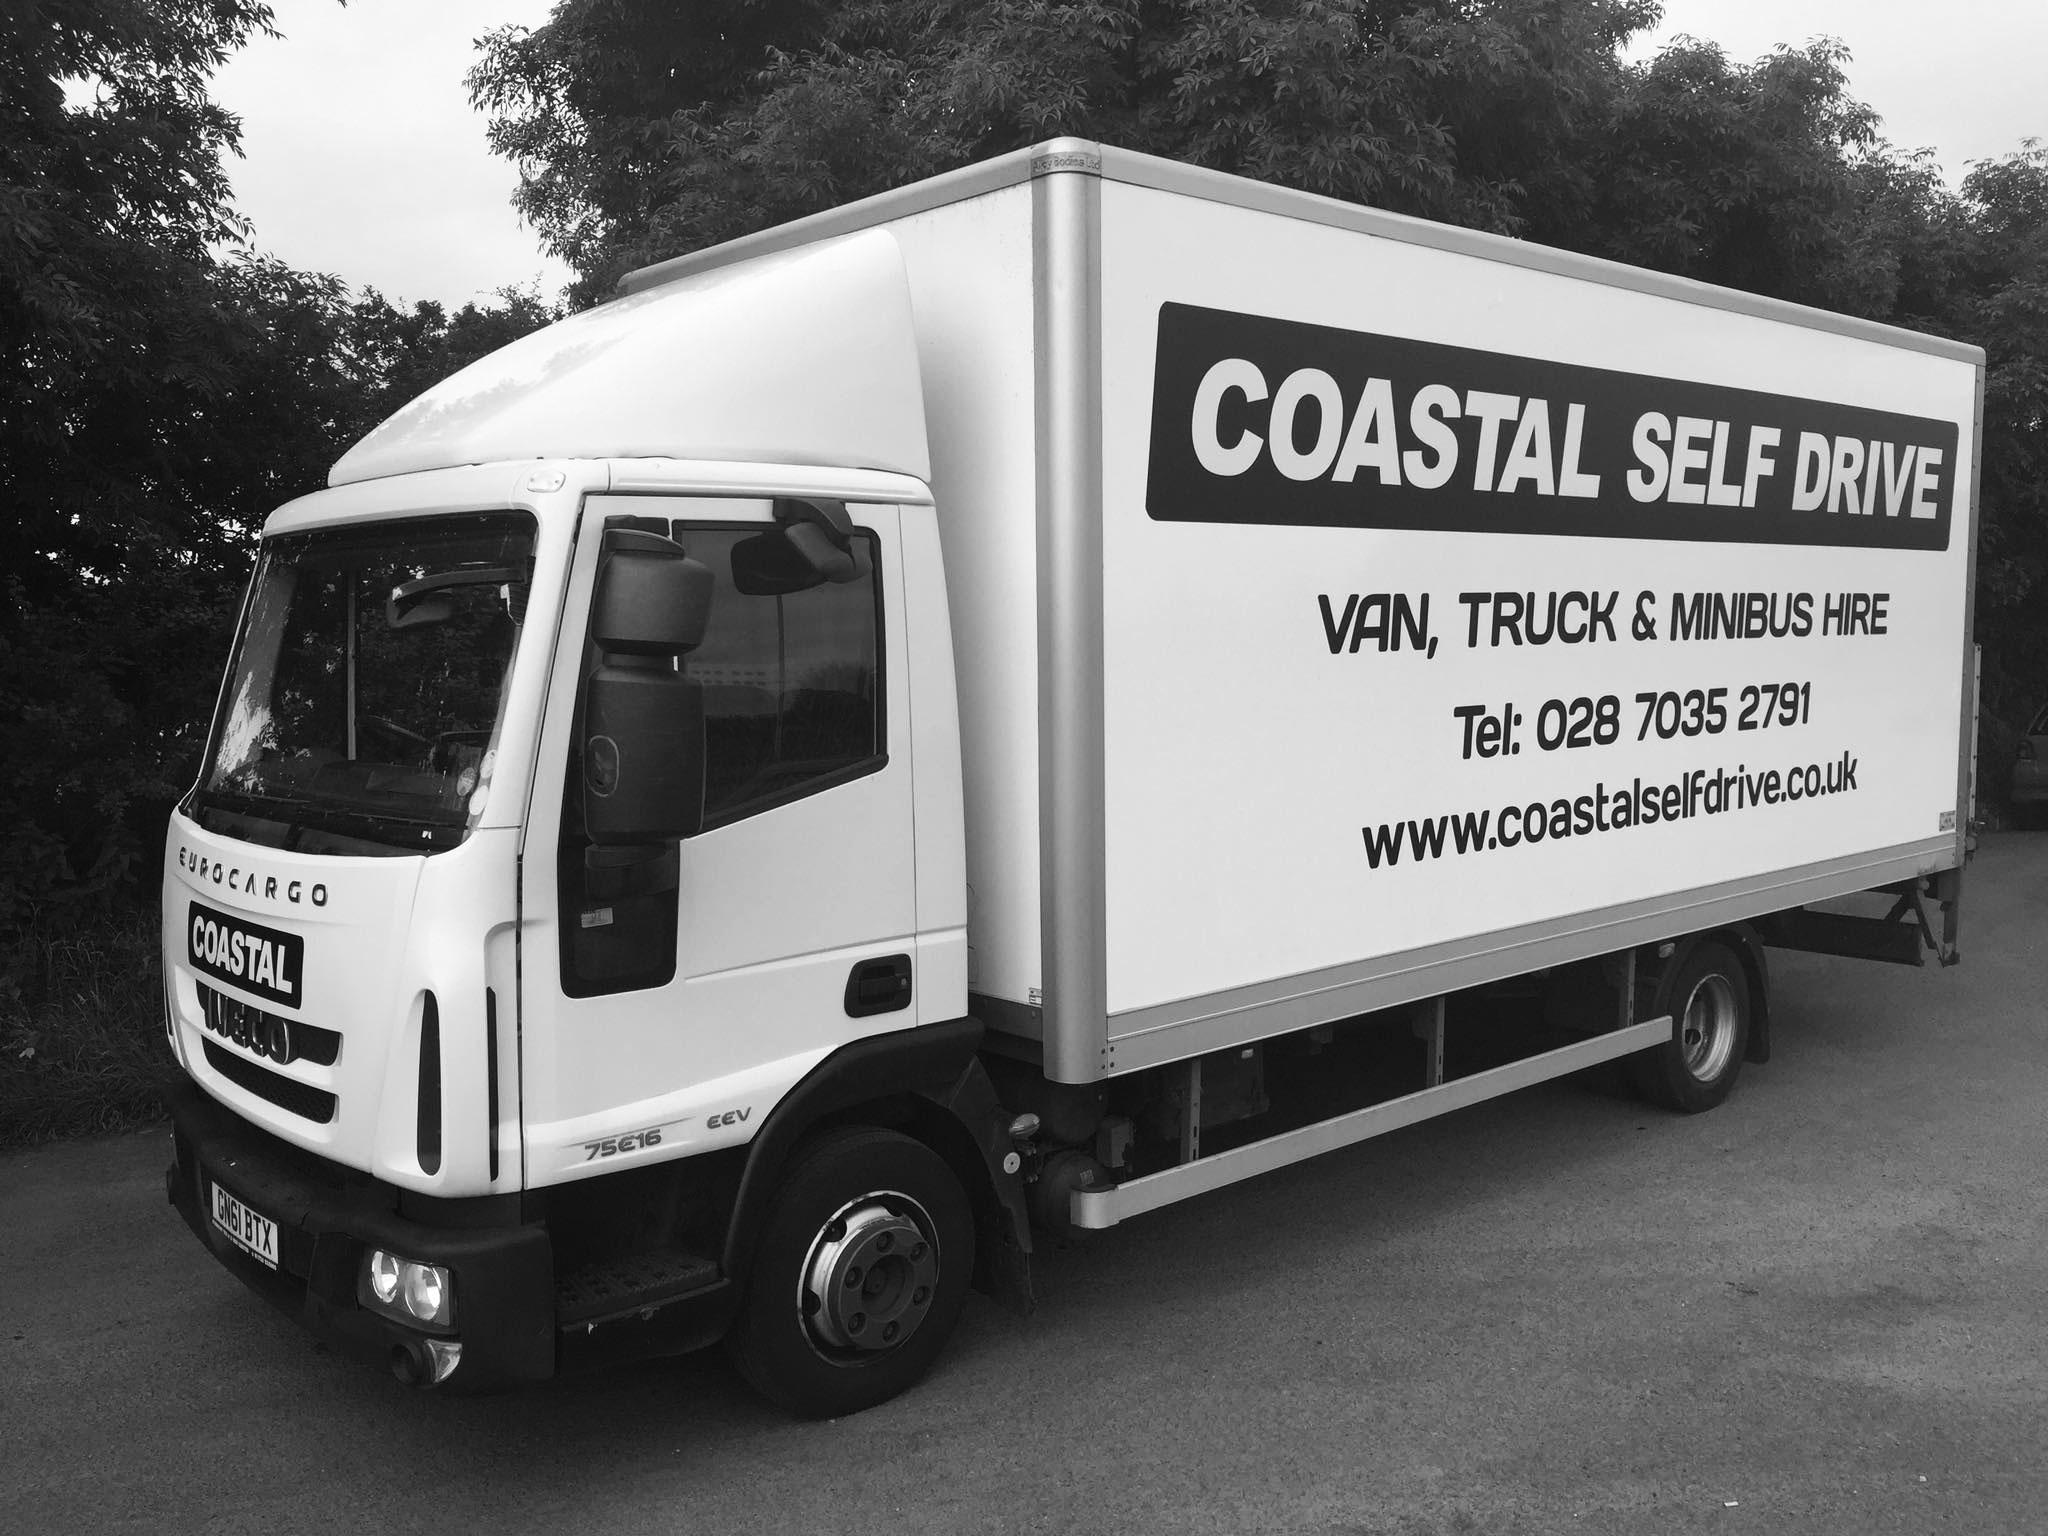 4dcab68dc009e3 7.5T Box Lorry with Tail-lift - Coastal Self Drive Ltd